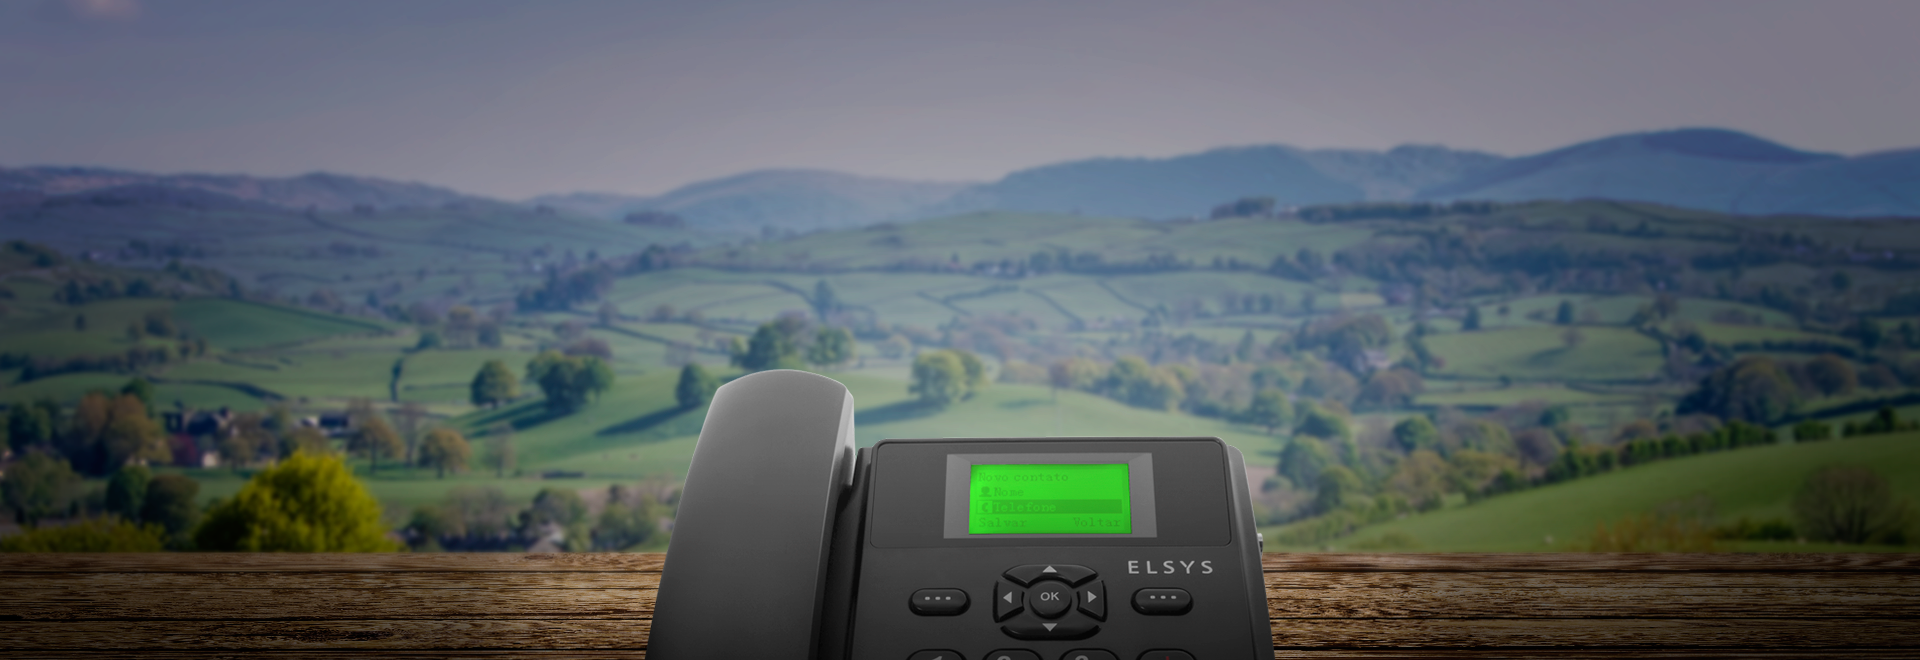 saiba tudo sobre o telefone rural